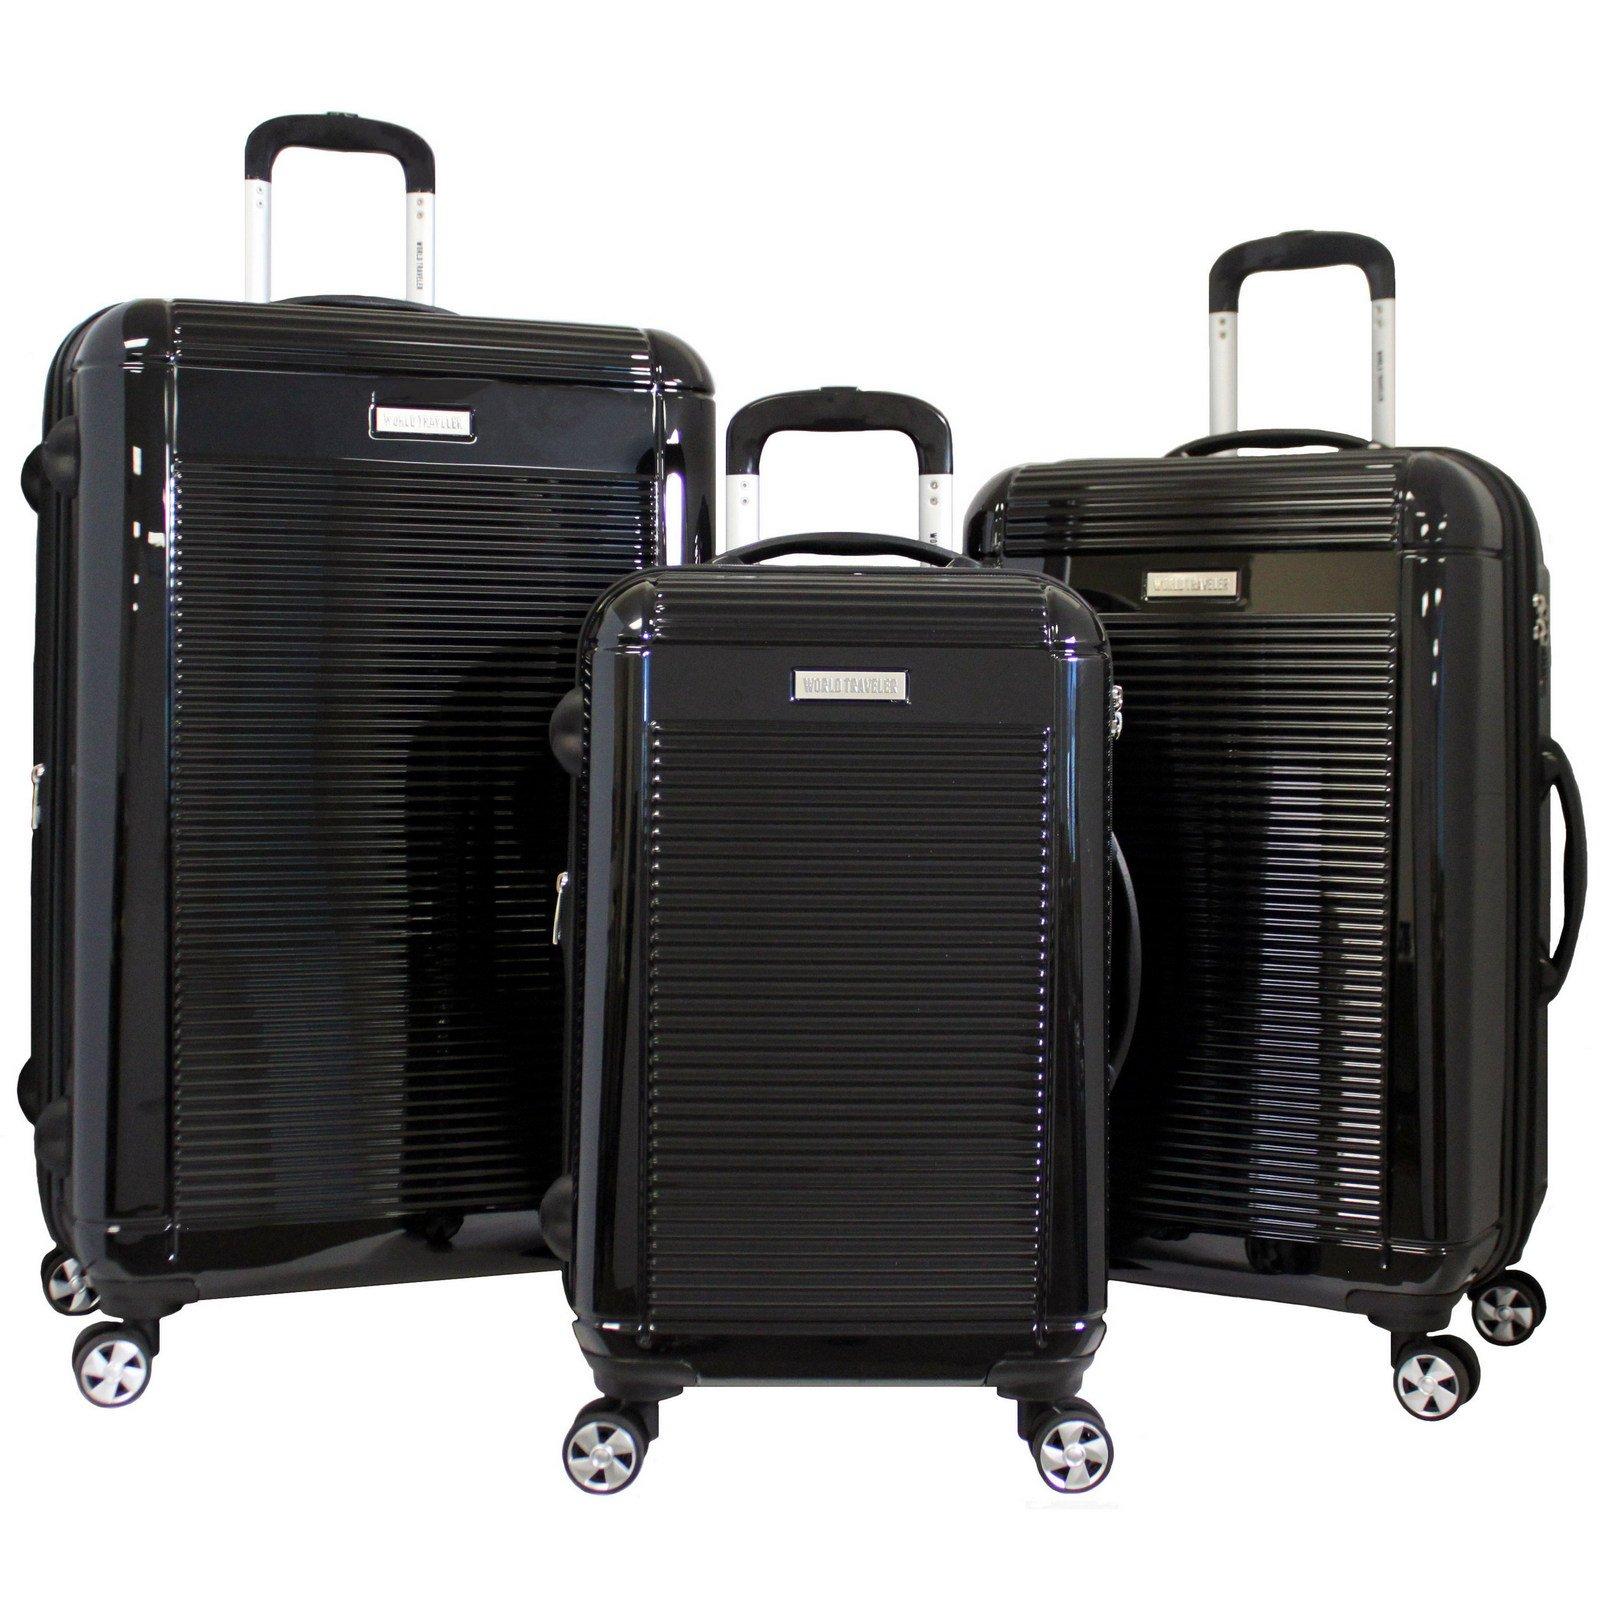 World Traveler Regal 3-Piece Hardside Lightweight Spinner Luggage Set, Black